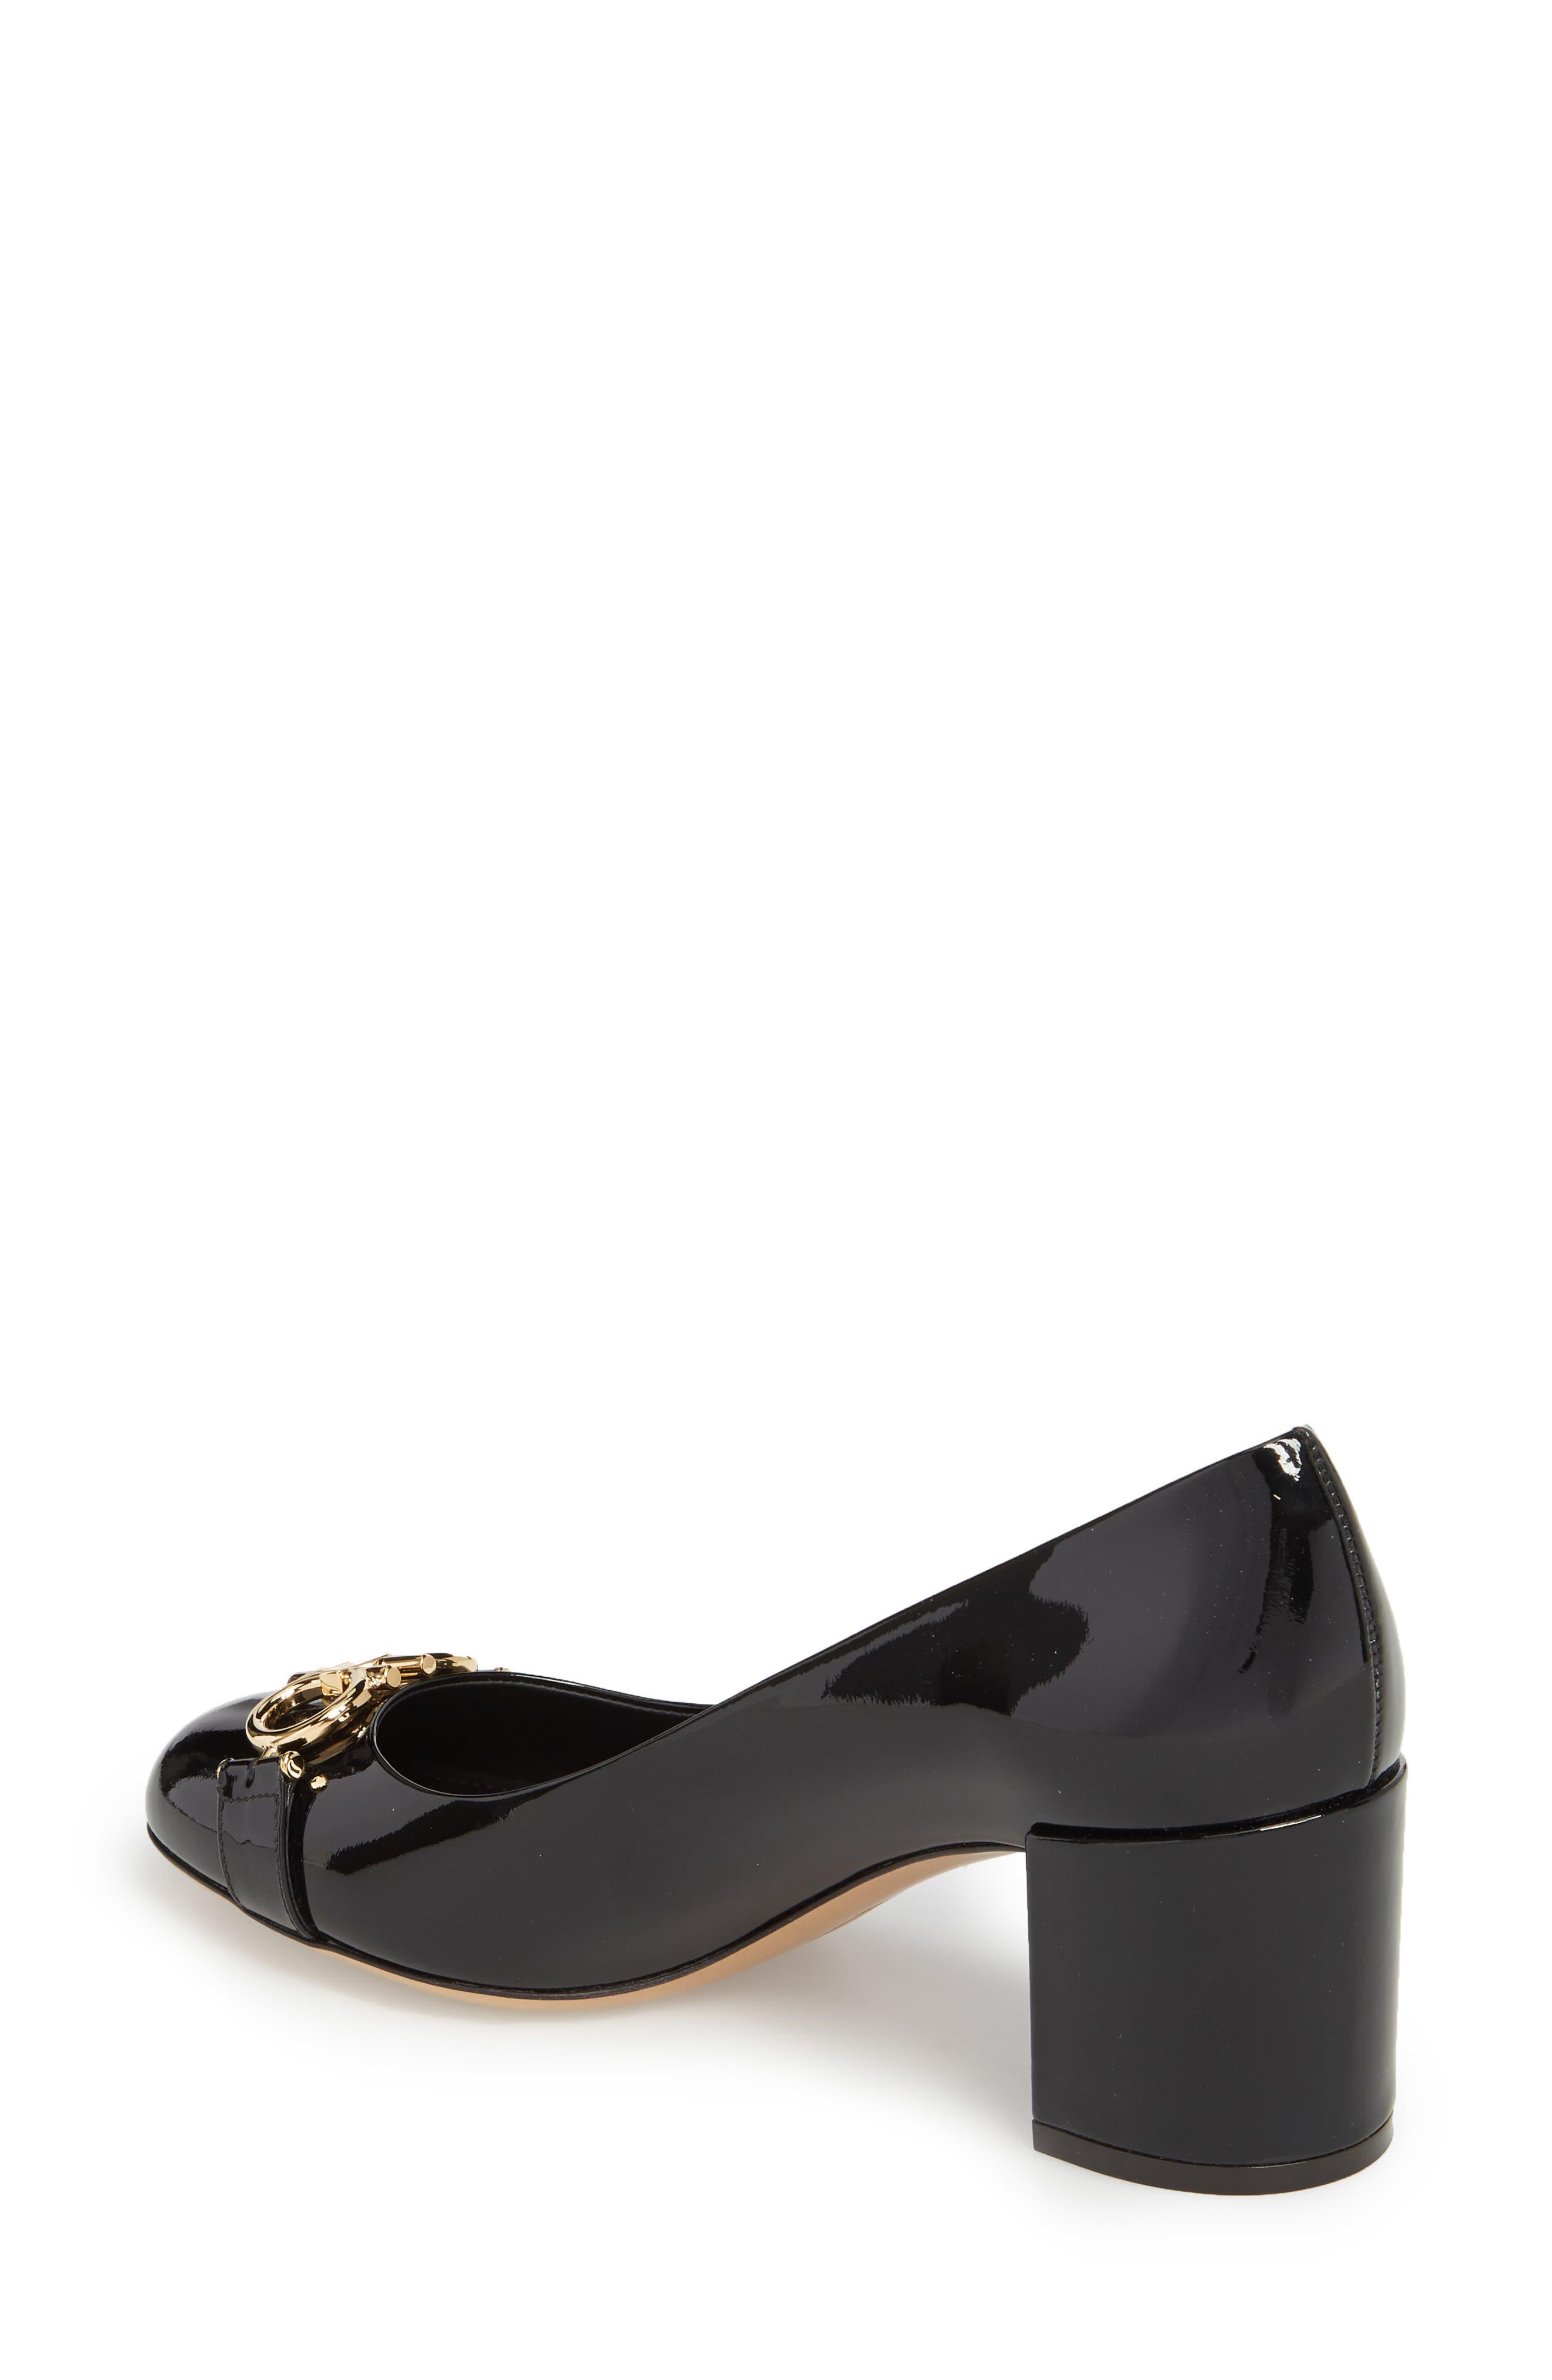 515ac8feb7b Women s Salvatore Ferragamo Heels